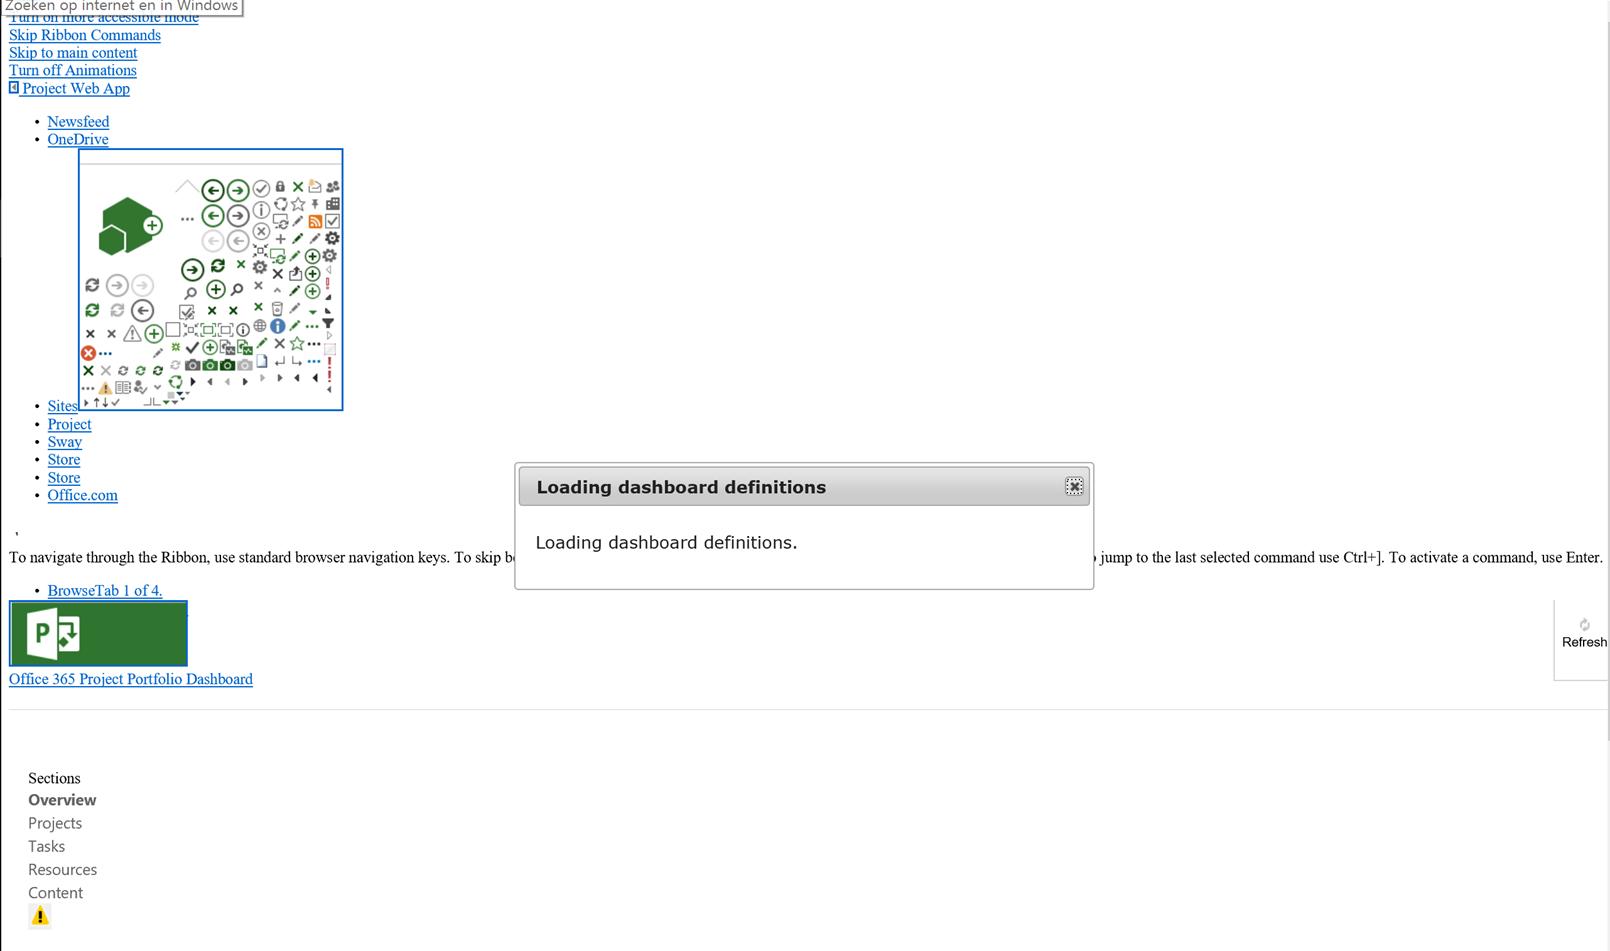 Office 265 Project Portfolio Dashboard app